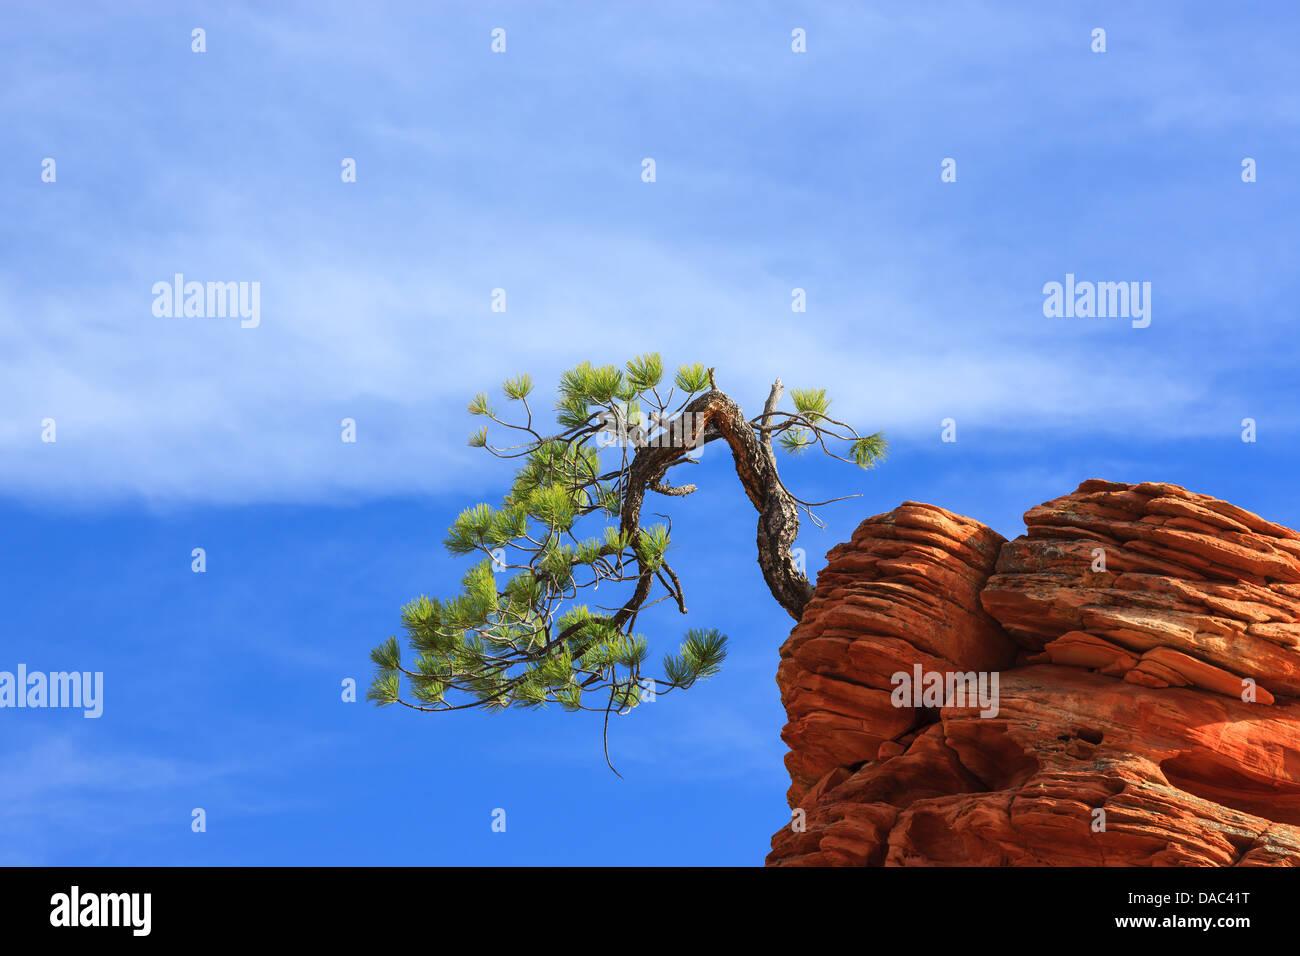 Pinyon pine (Pinus edulis) on sandstone at Zion National Park - Stock Image